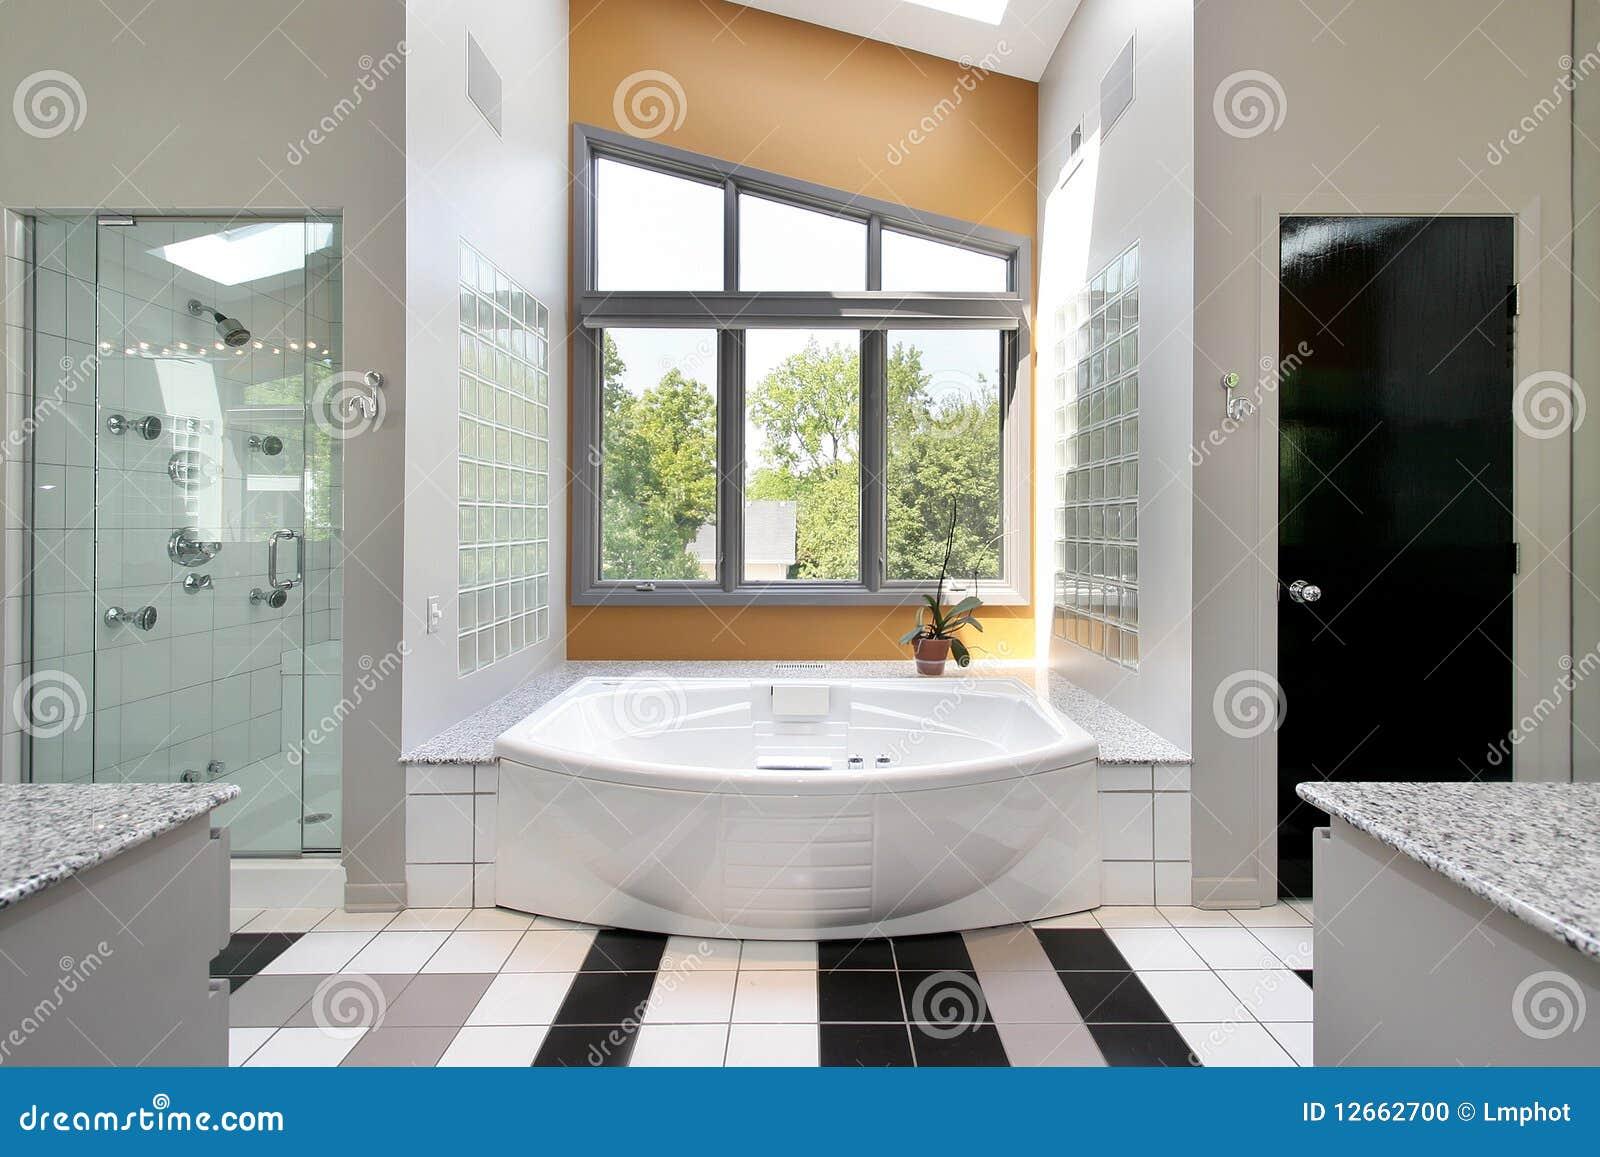 Baños Residenciales Modernos:Modern Master Bathroom